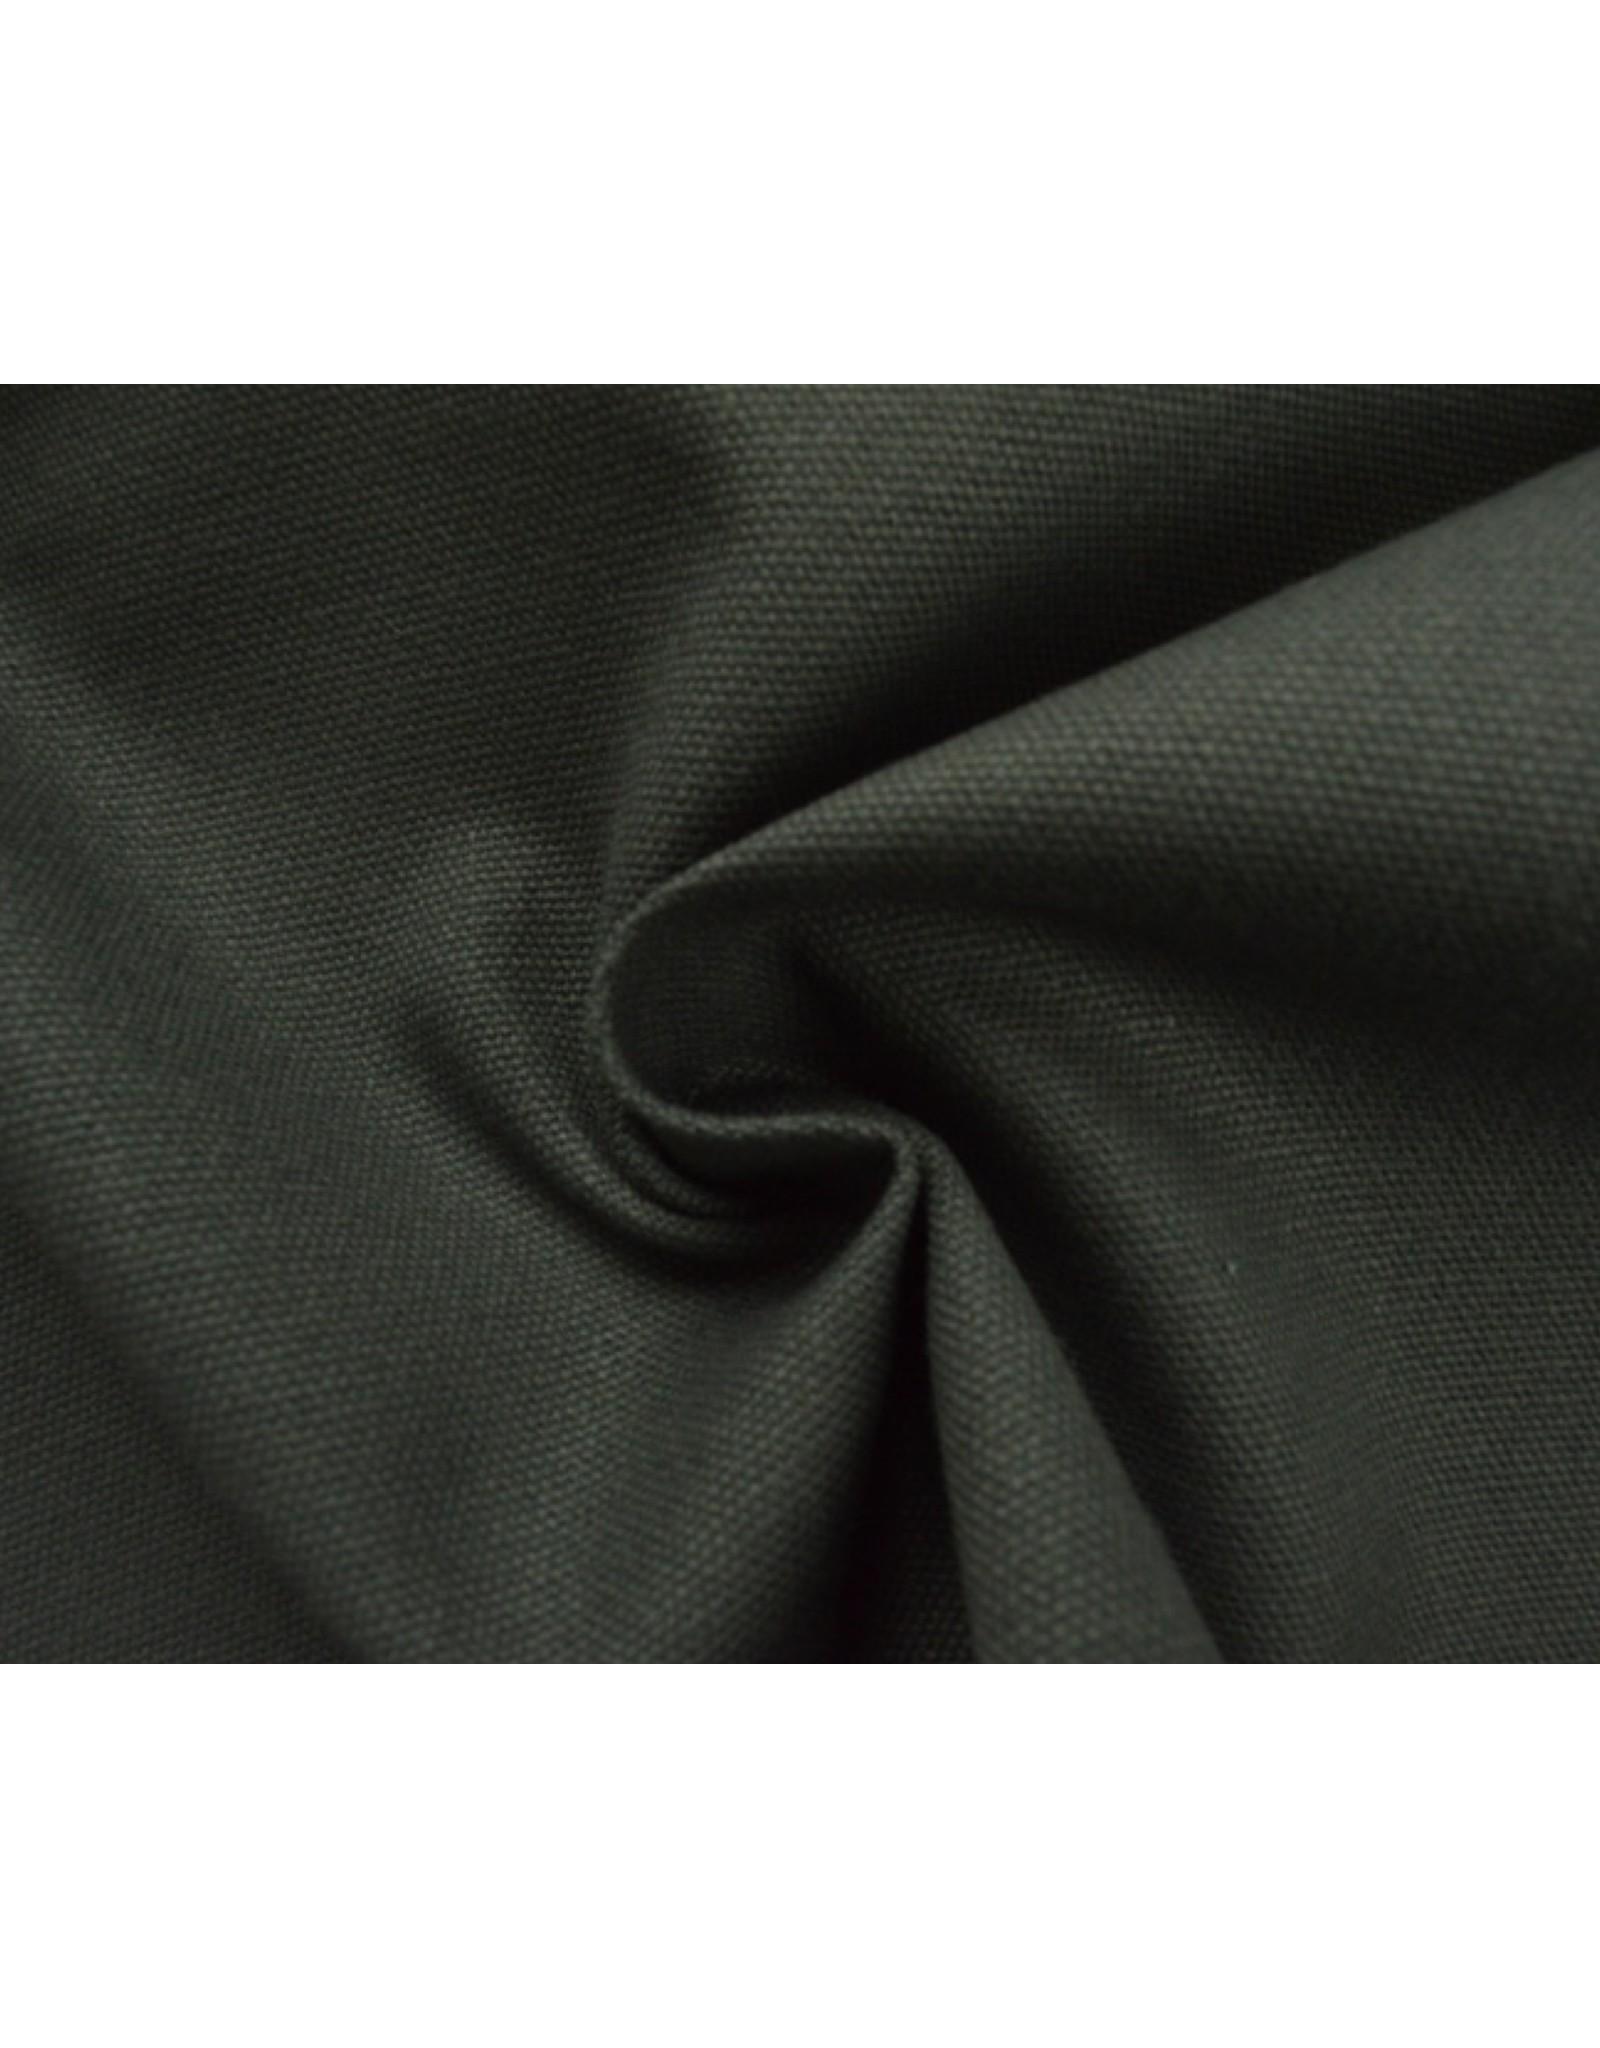 Kanvas stoff Uni - DK Grau (350 gr/m)